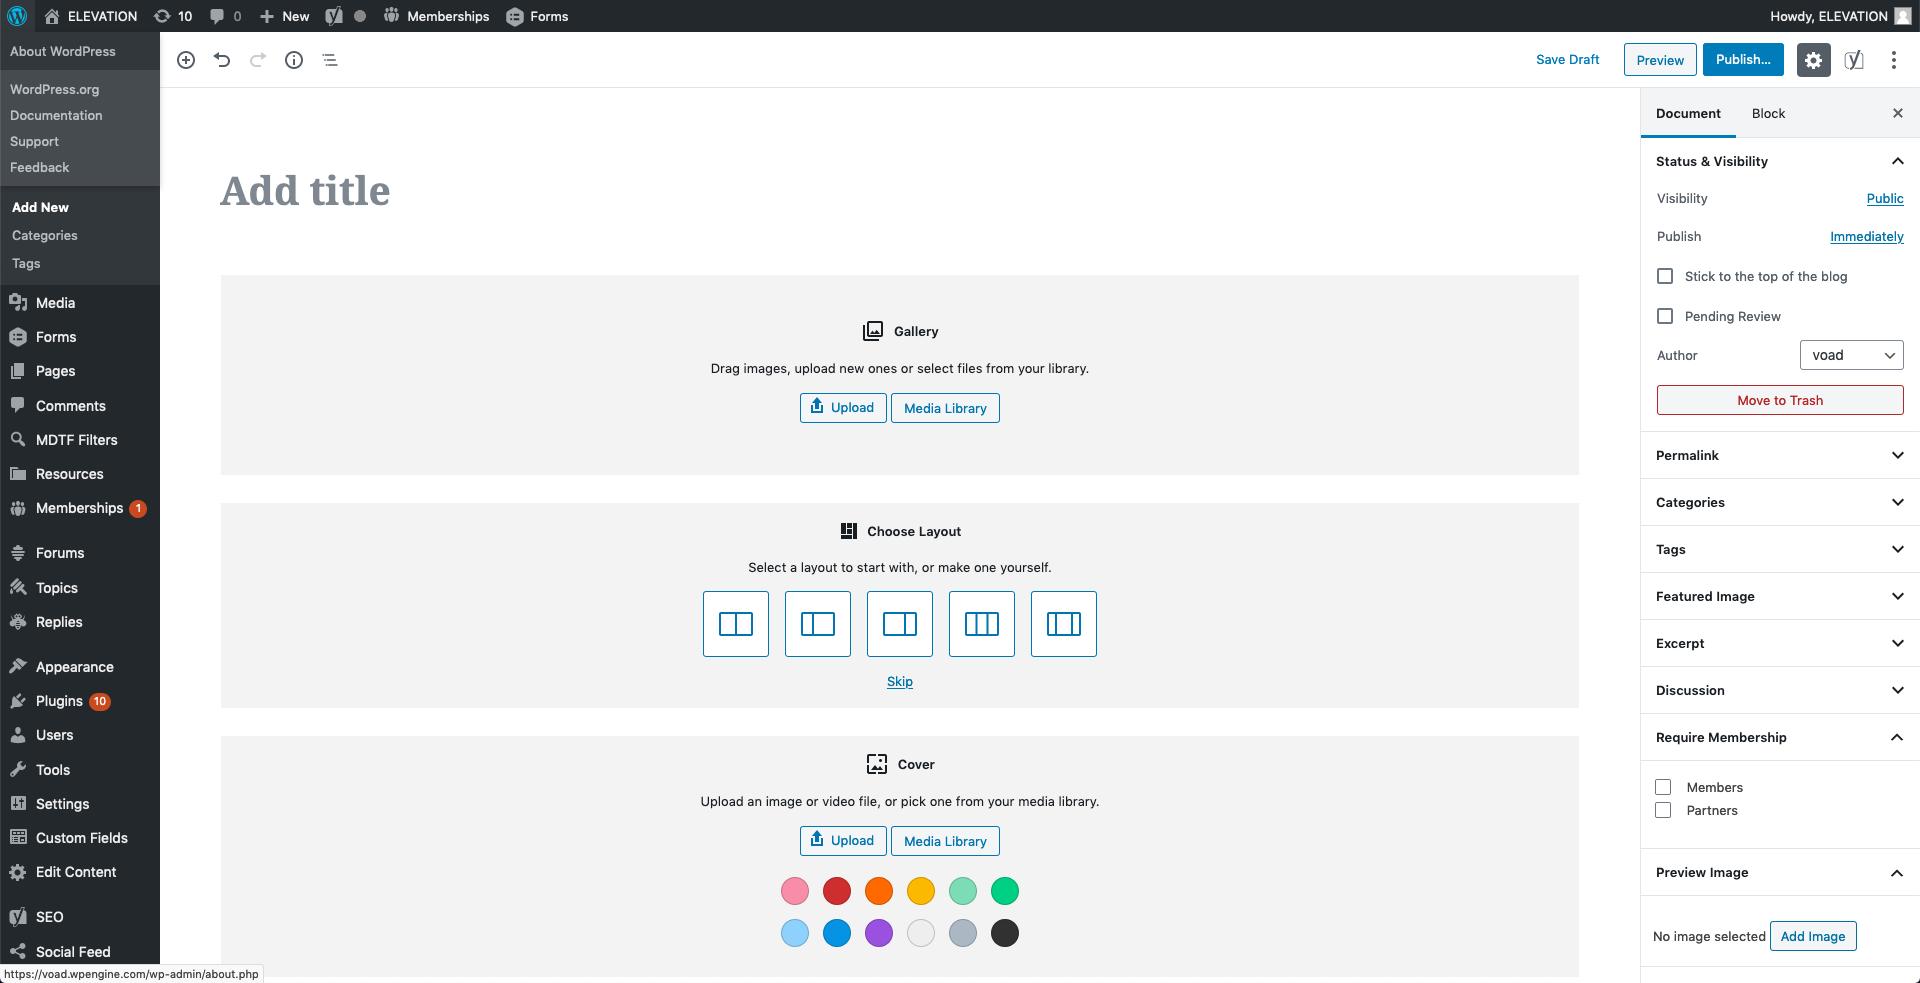 Screenshot of WordPress